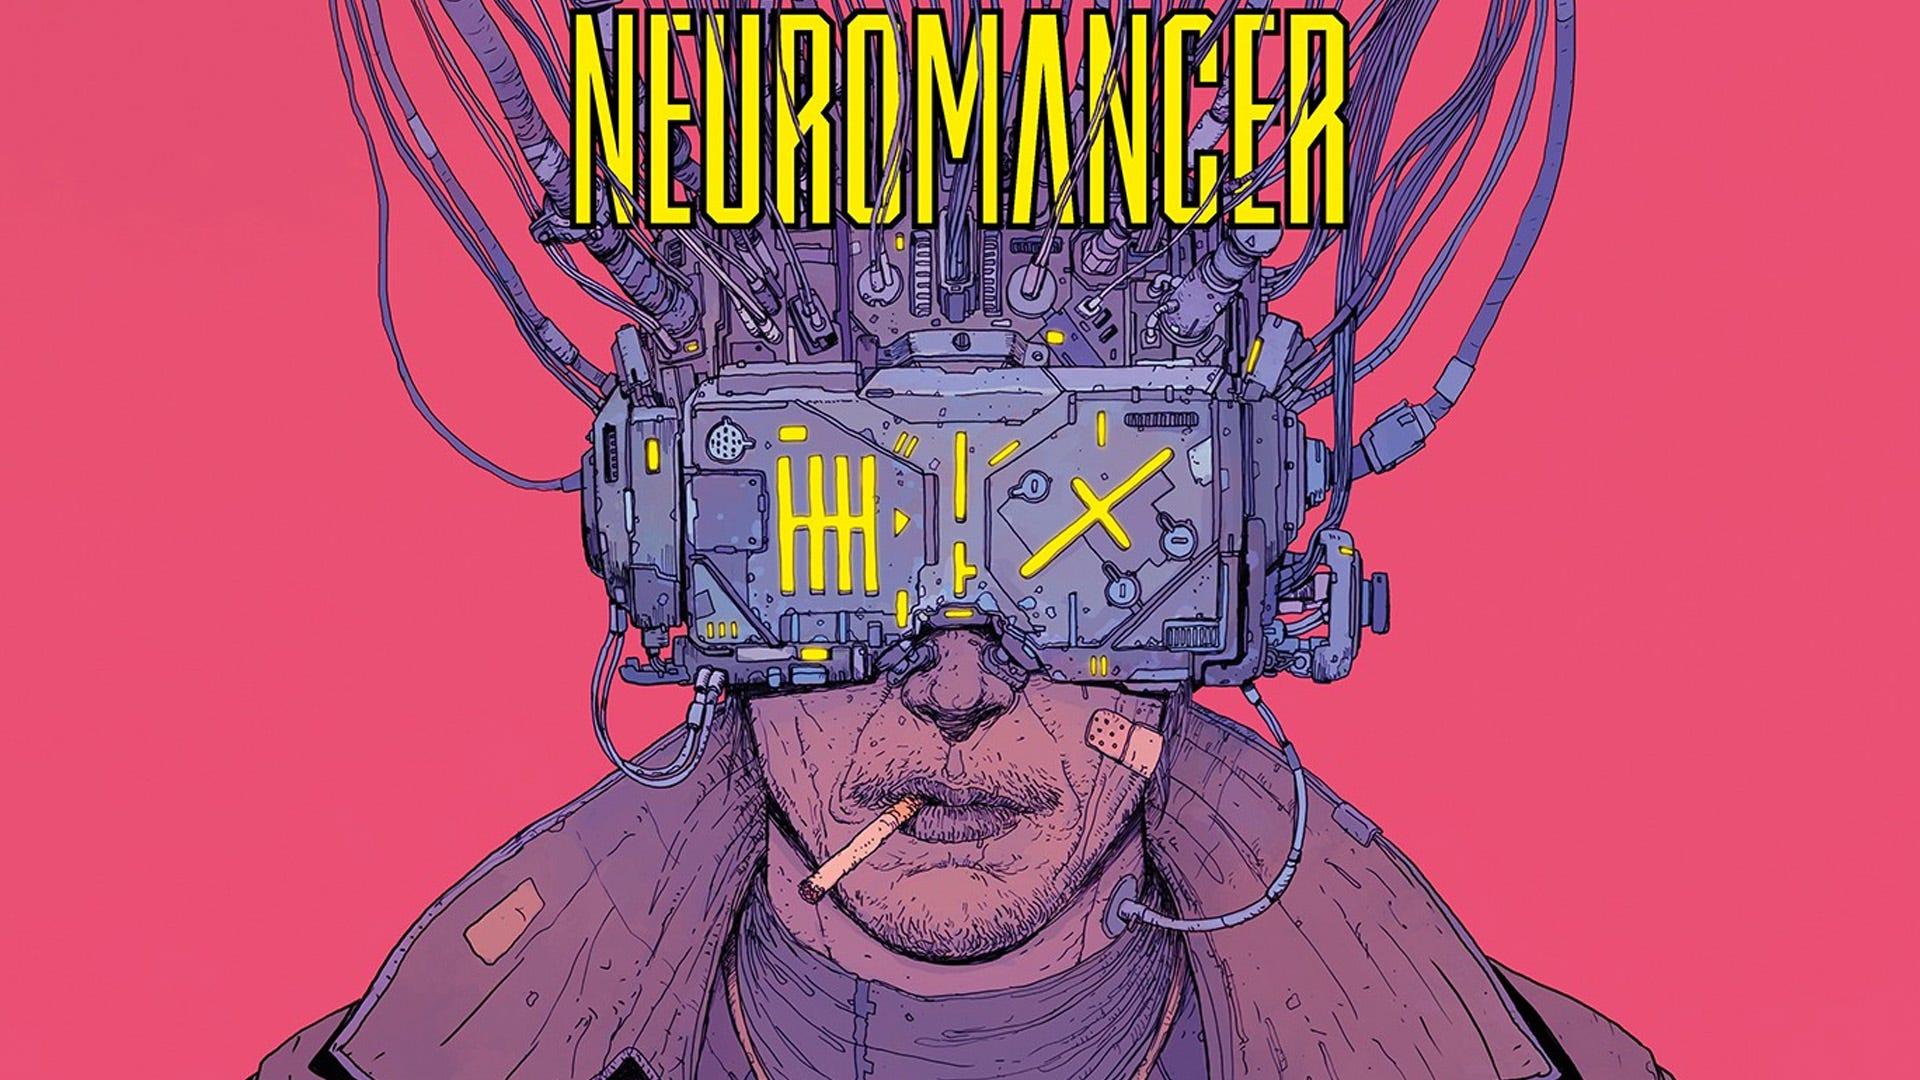 Neuromancer cover art, Brazilian edition